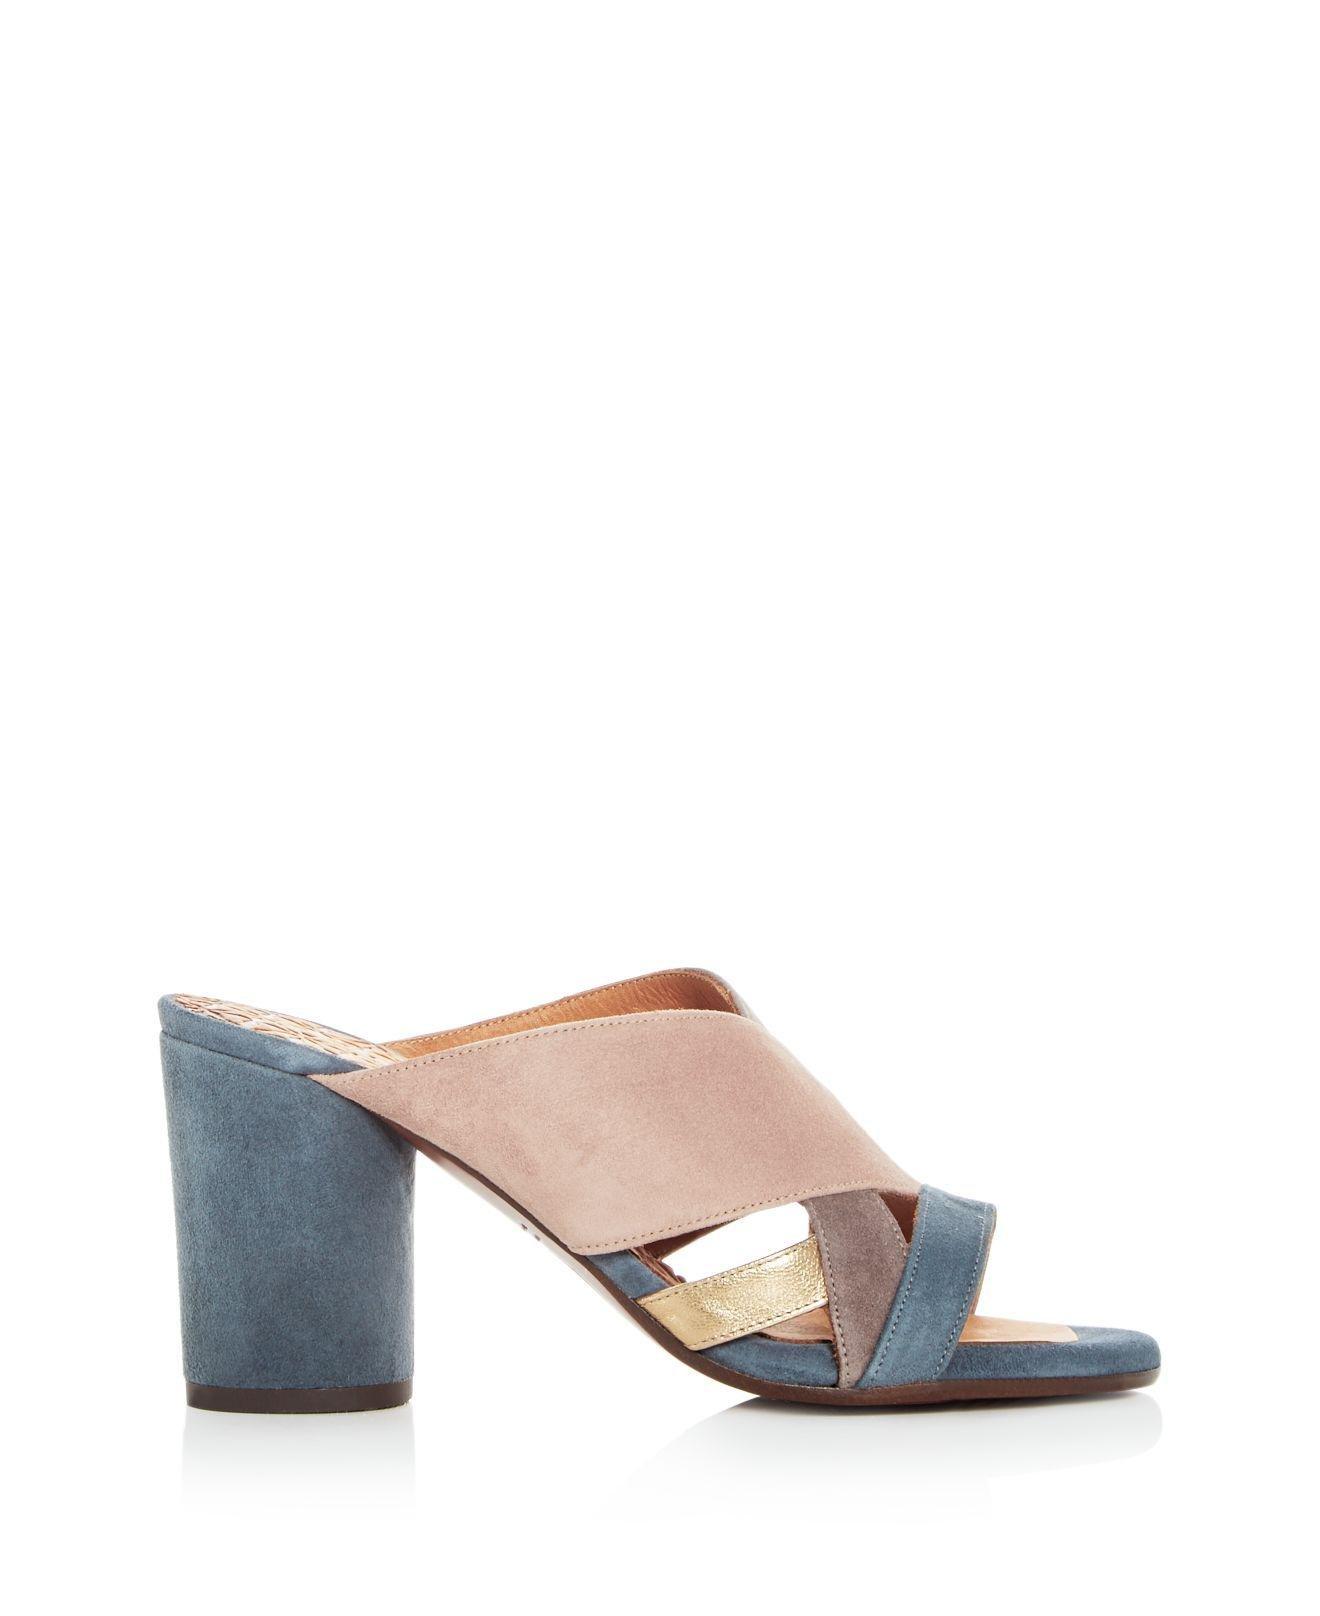 Chie Mihara Women's Uni Suede Round Block Heel Slide Sandals - 100% Exclusive CqFegBpGl